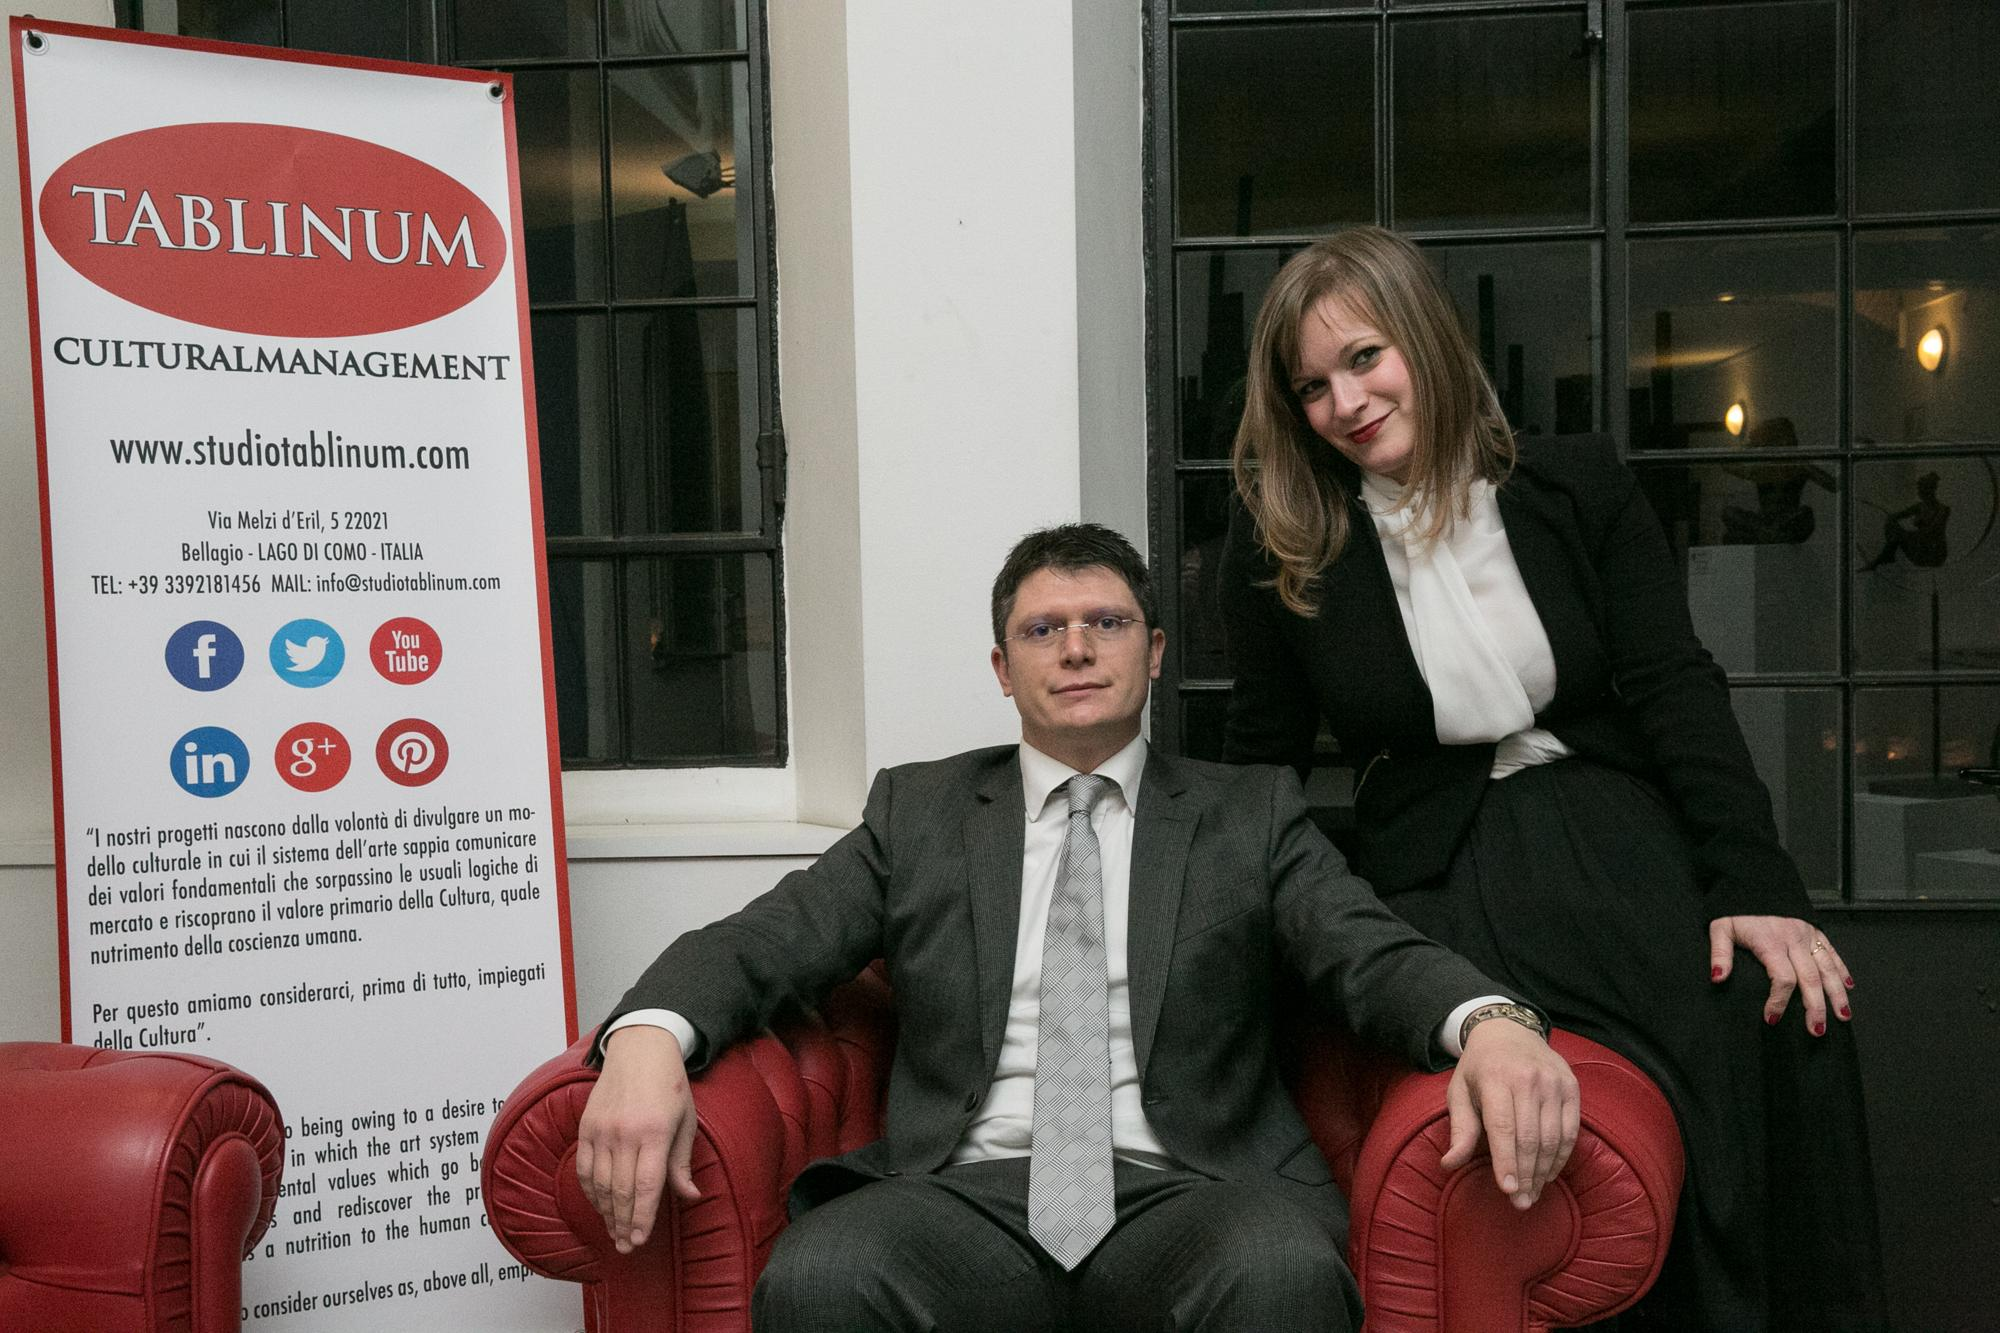 Tablinum Cultural Management